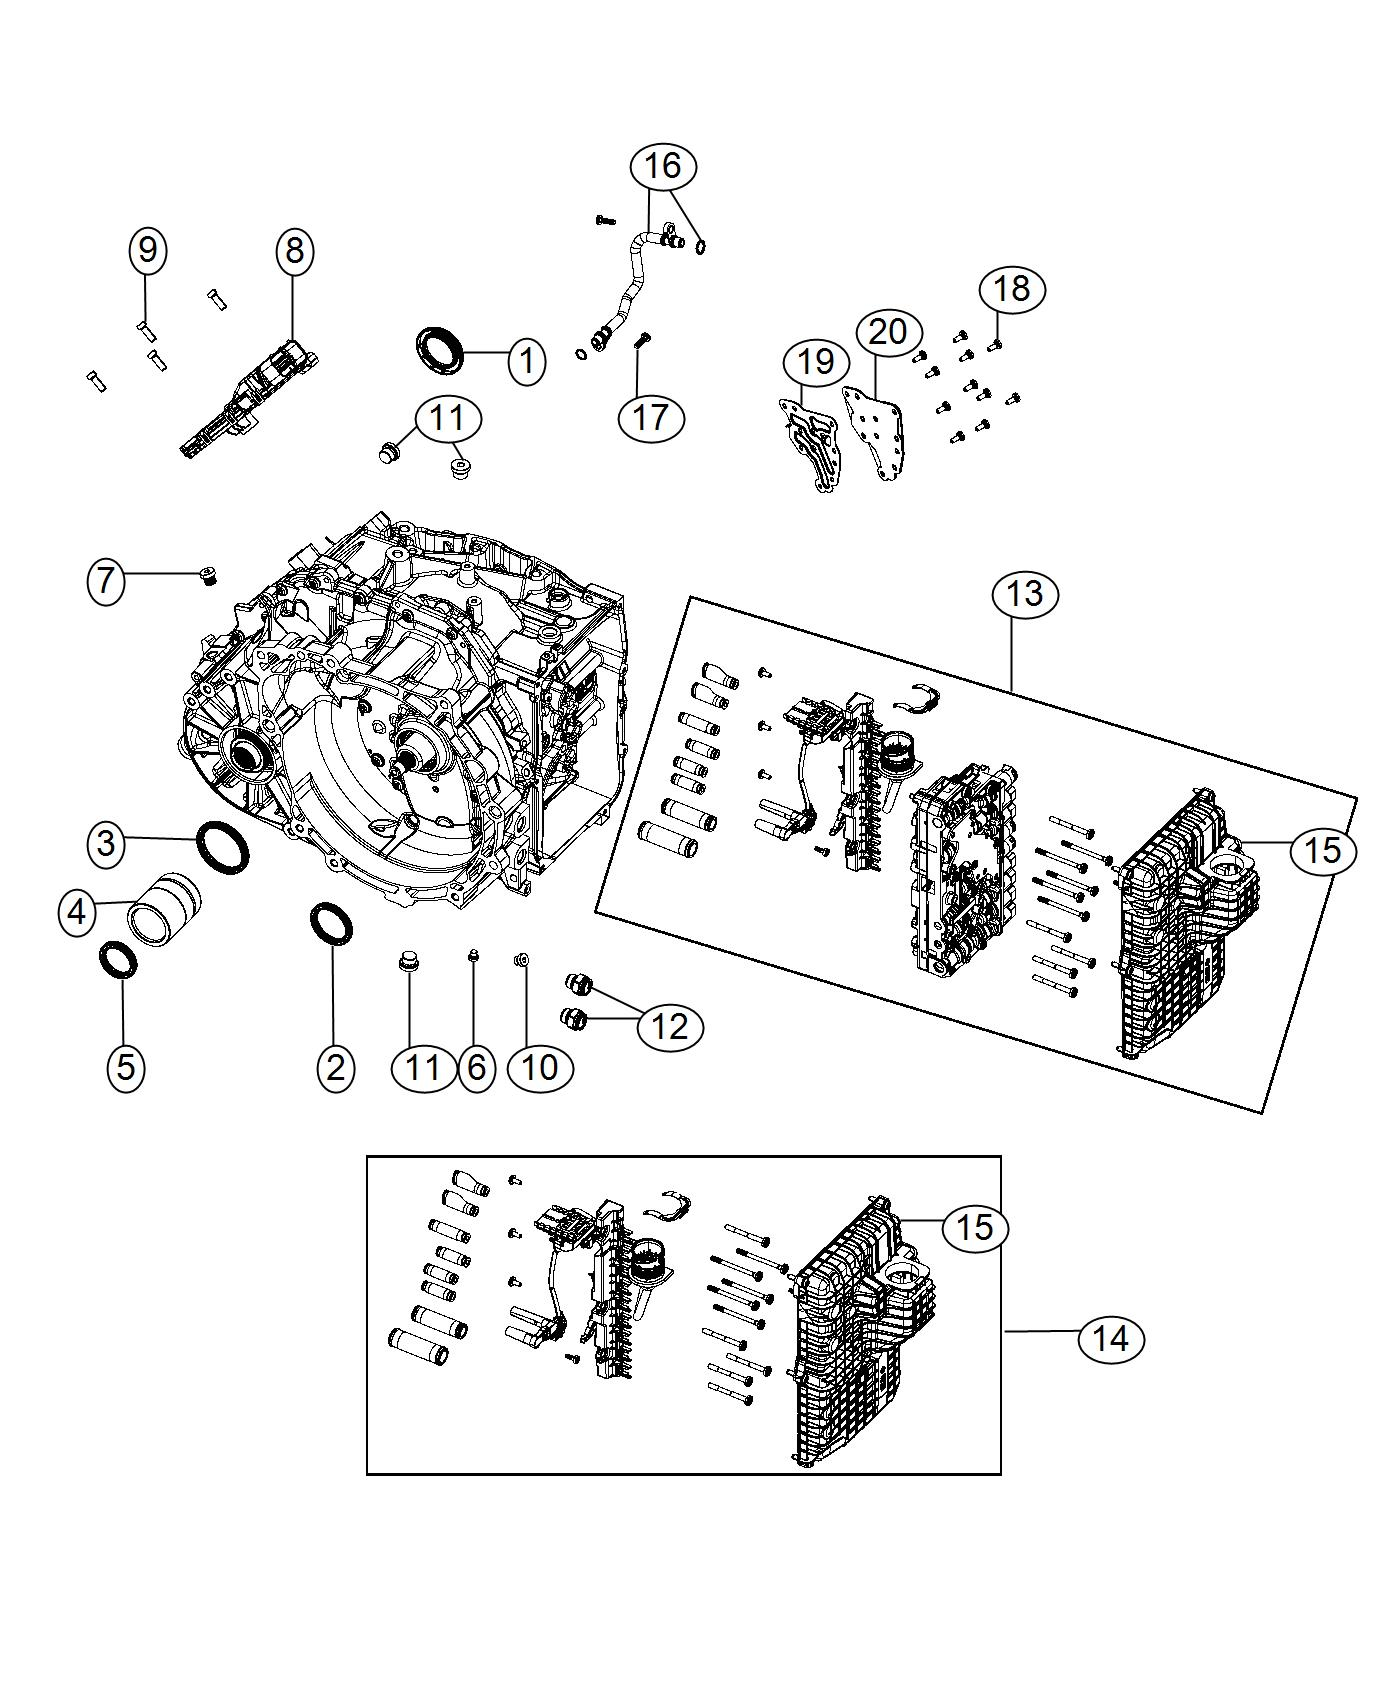 Jeep Compass Wiring. Transmission jumper. [4.30 rear axle ...